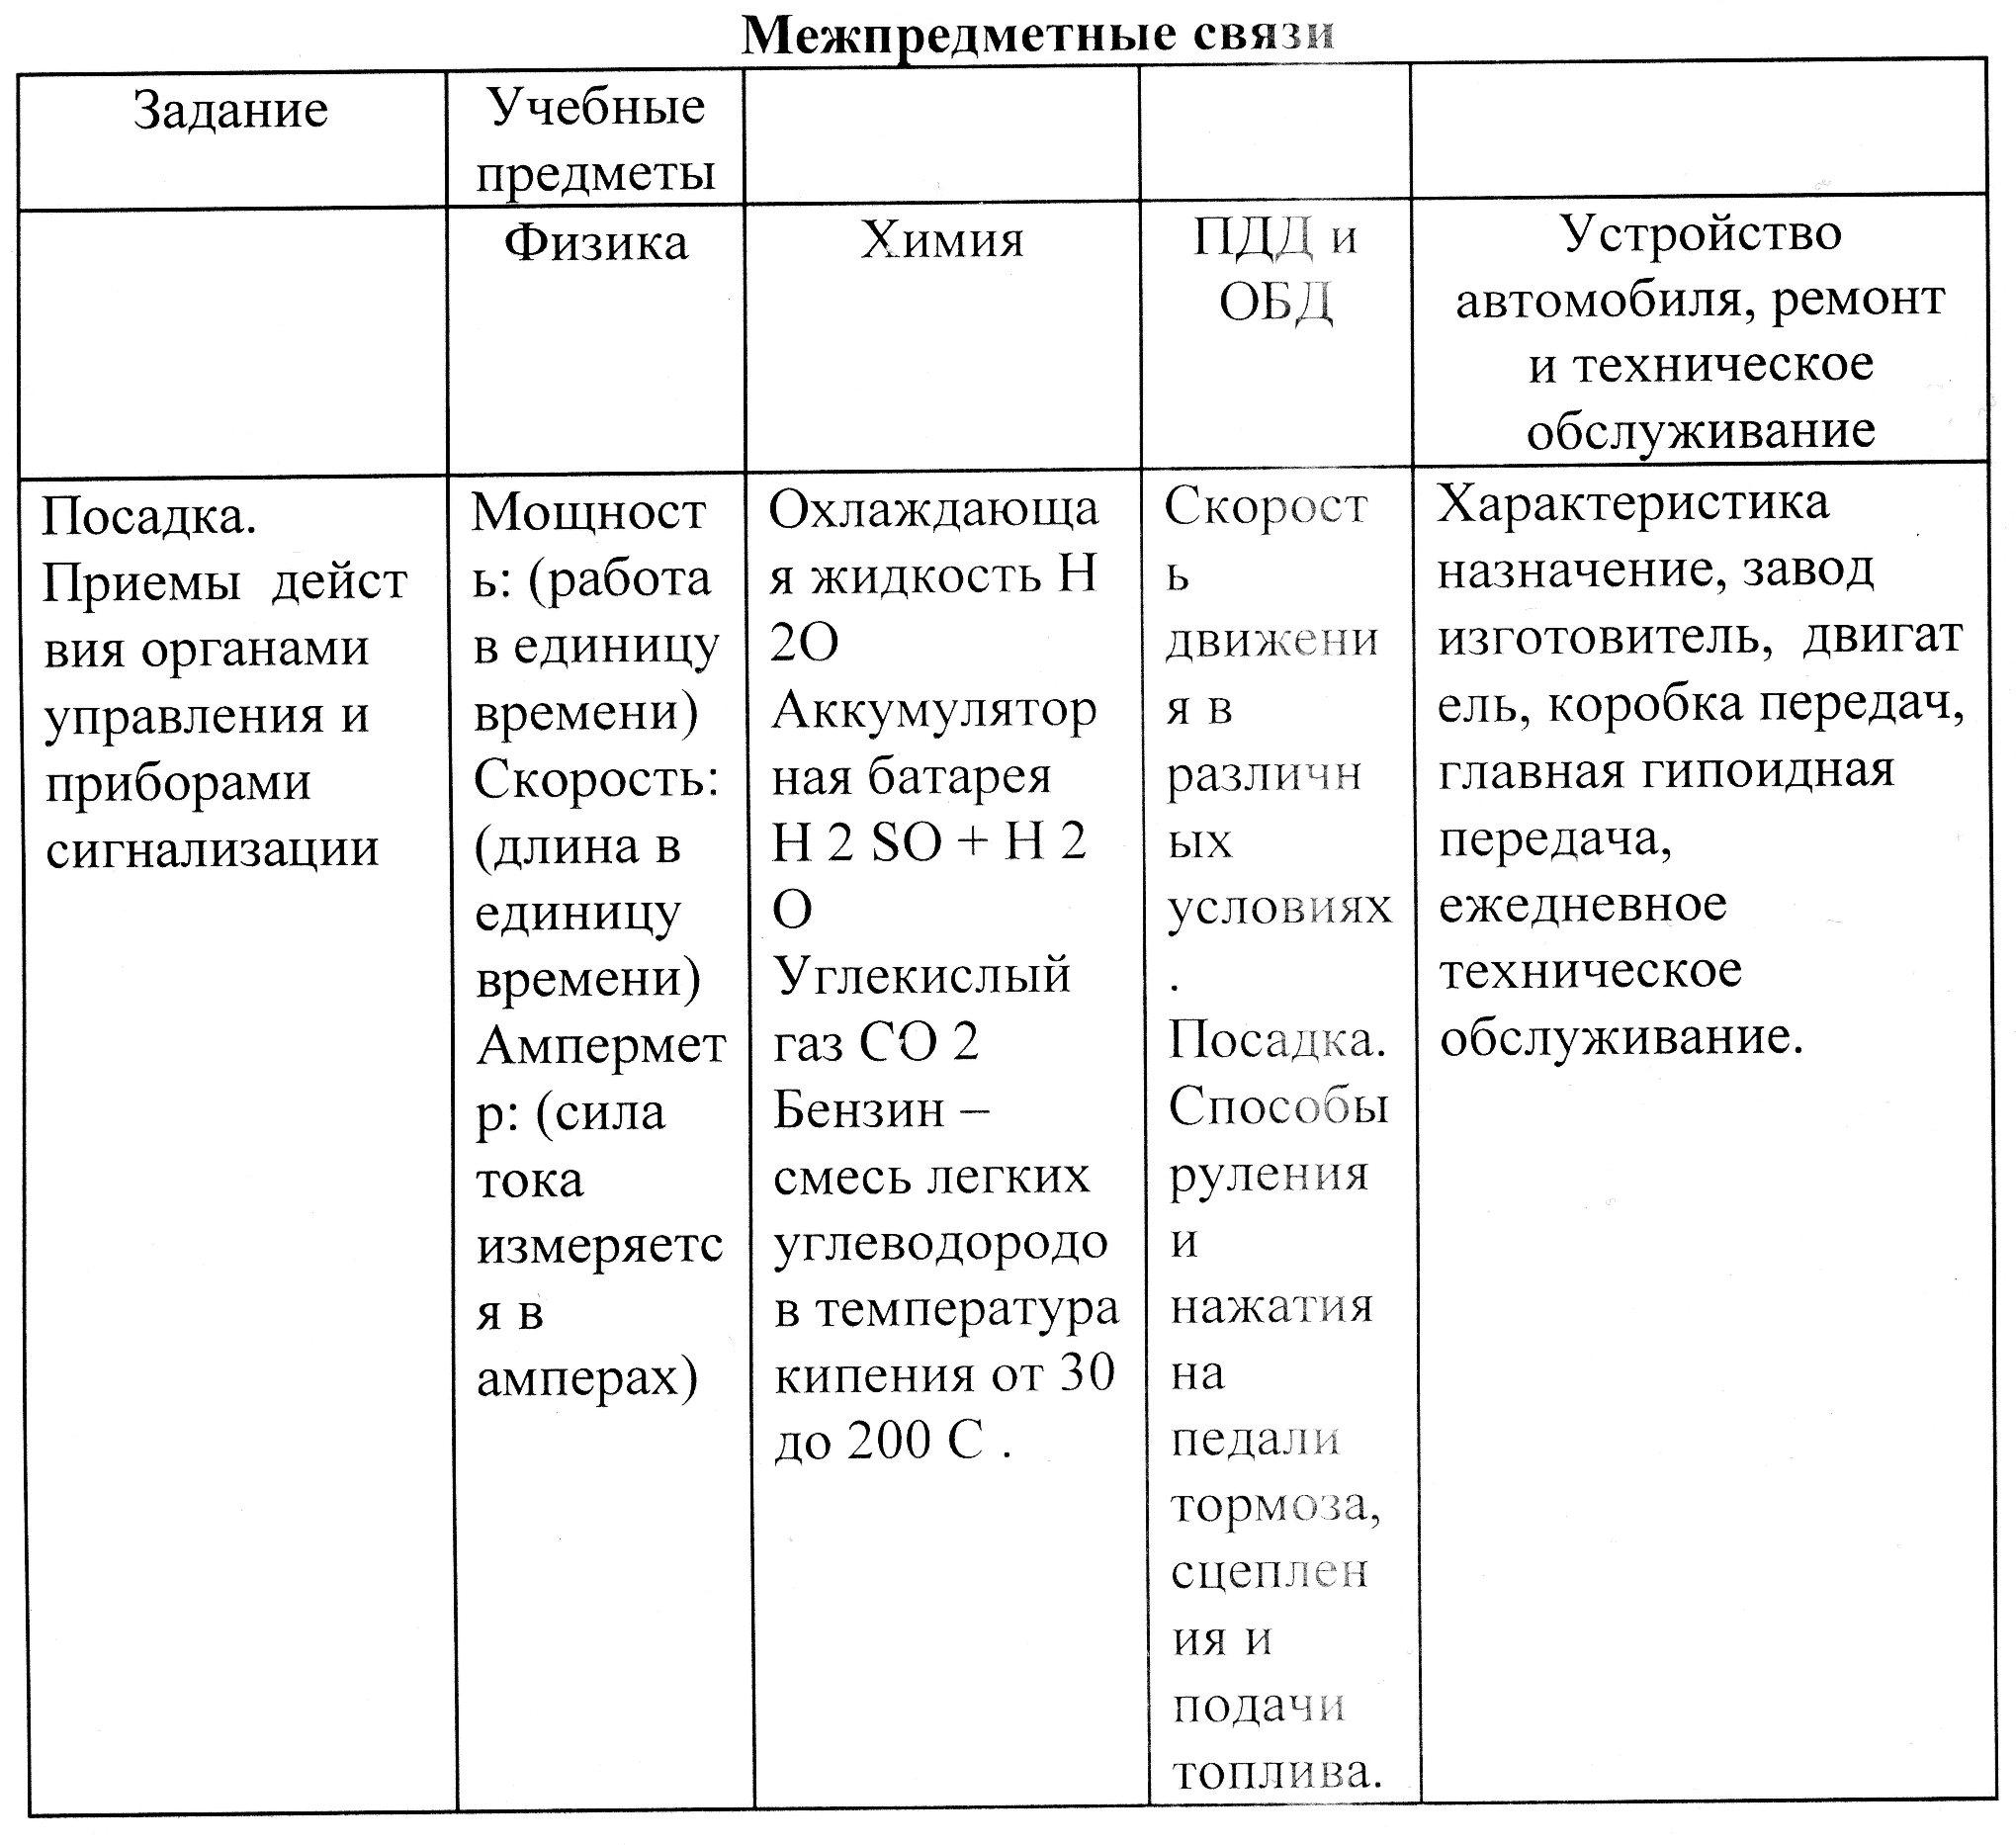 C:\Users\Василий Мельченко\Pictures\img634.jpg